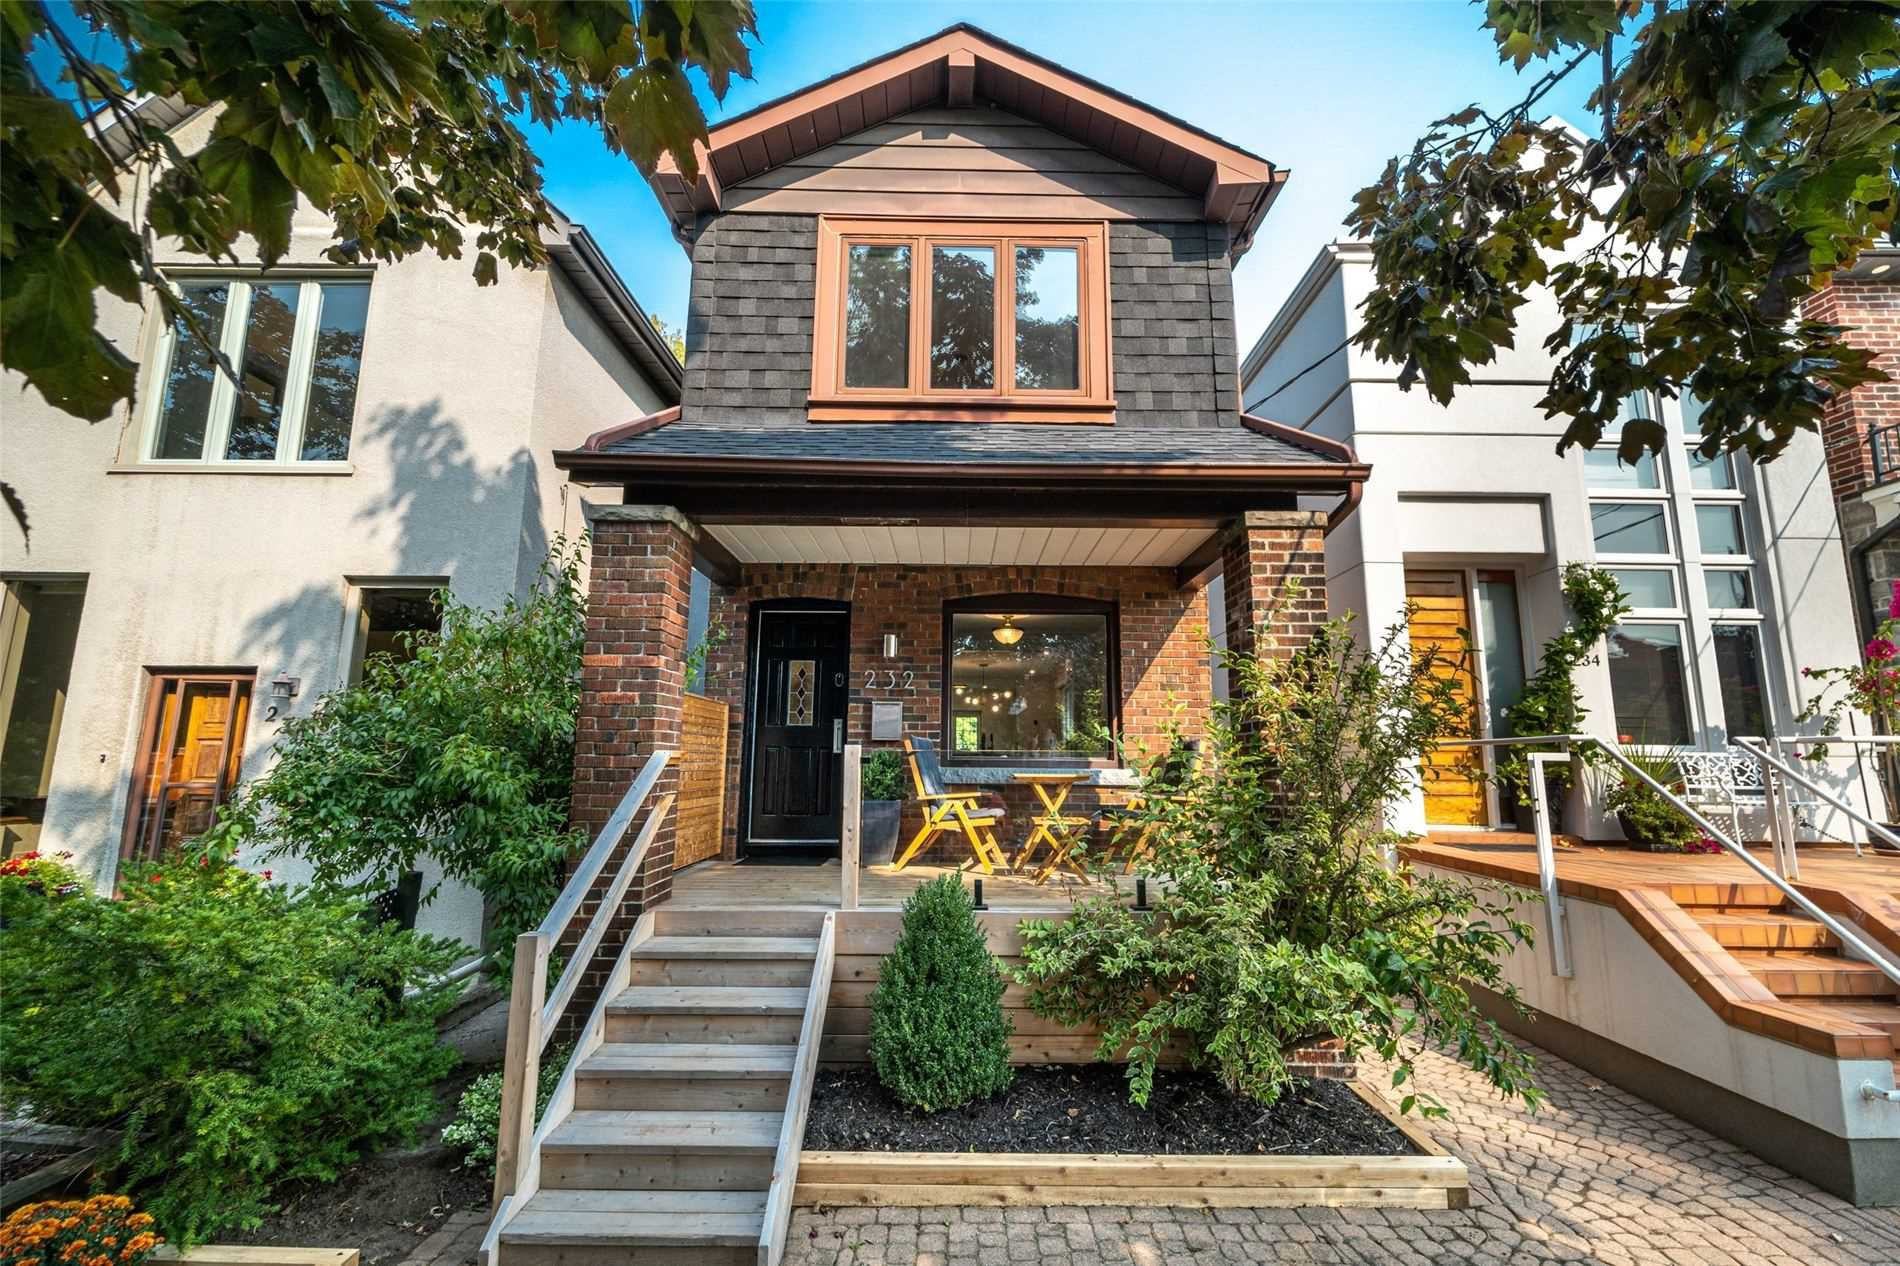 Main Photo: 232 Fulton Avenue in Toronto: Playter Estates-Danforth House (2-Storey) for sale (Toronto E03)  : MLS®# E4912894